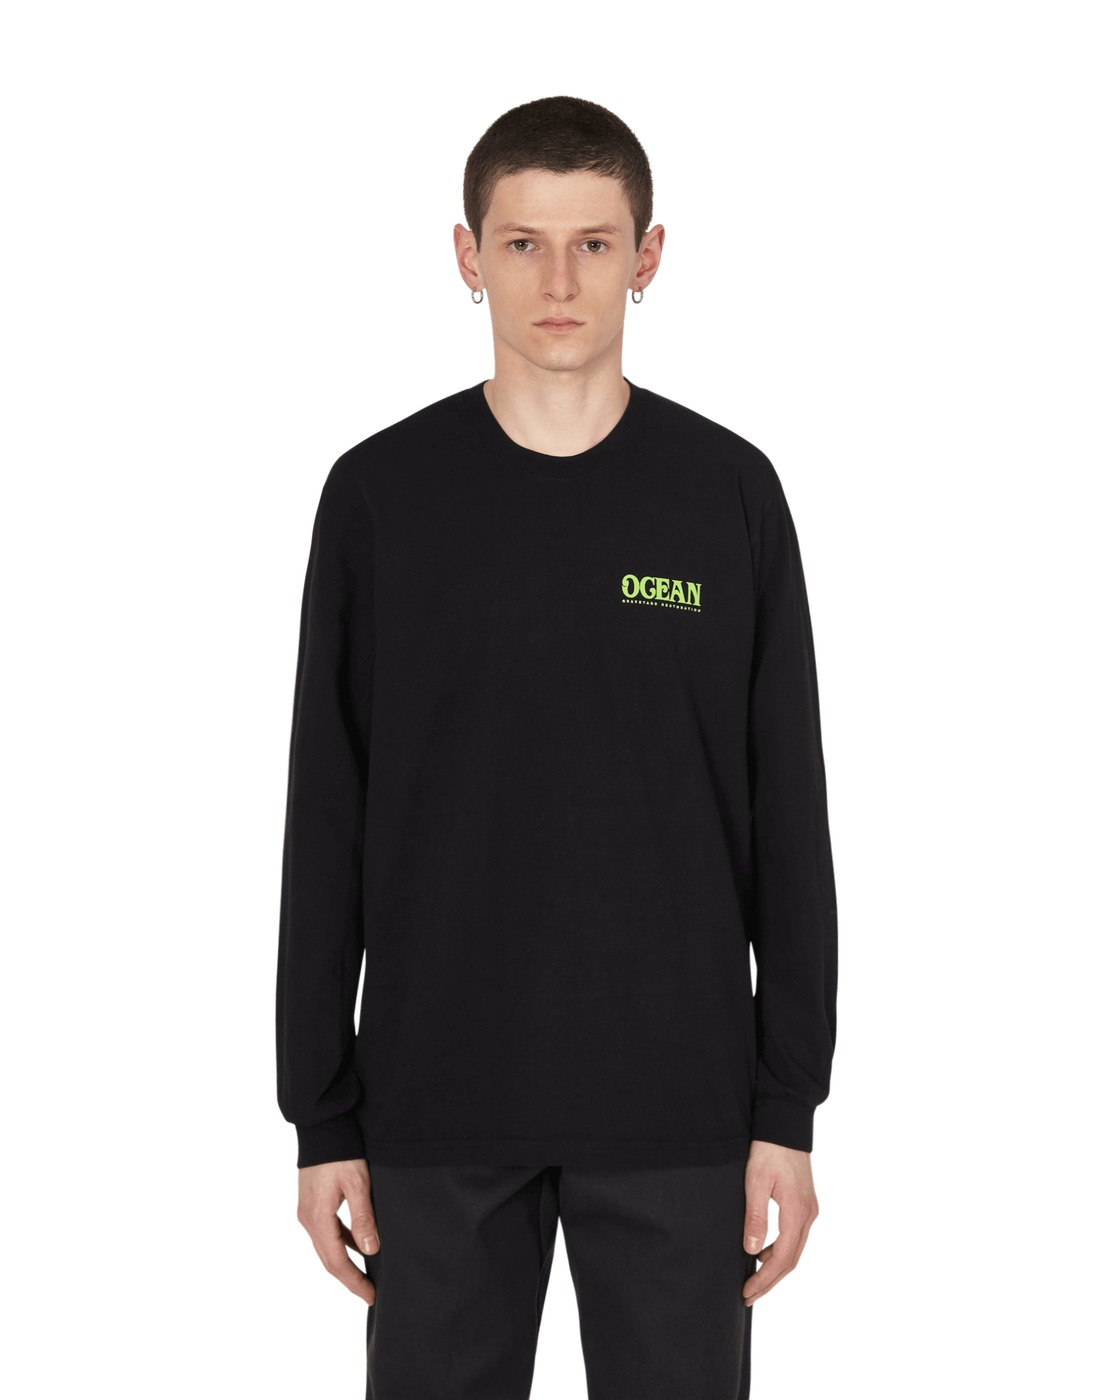 Eden Power Corp Ocean Recycled Longsleeve T Shirt Black